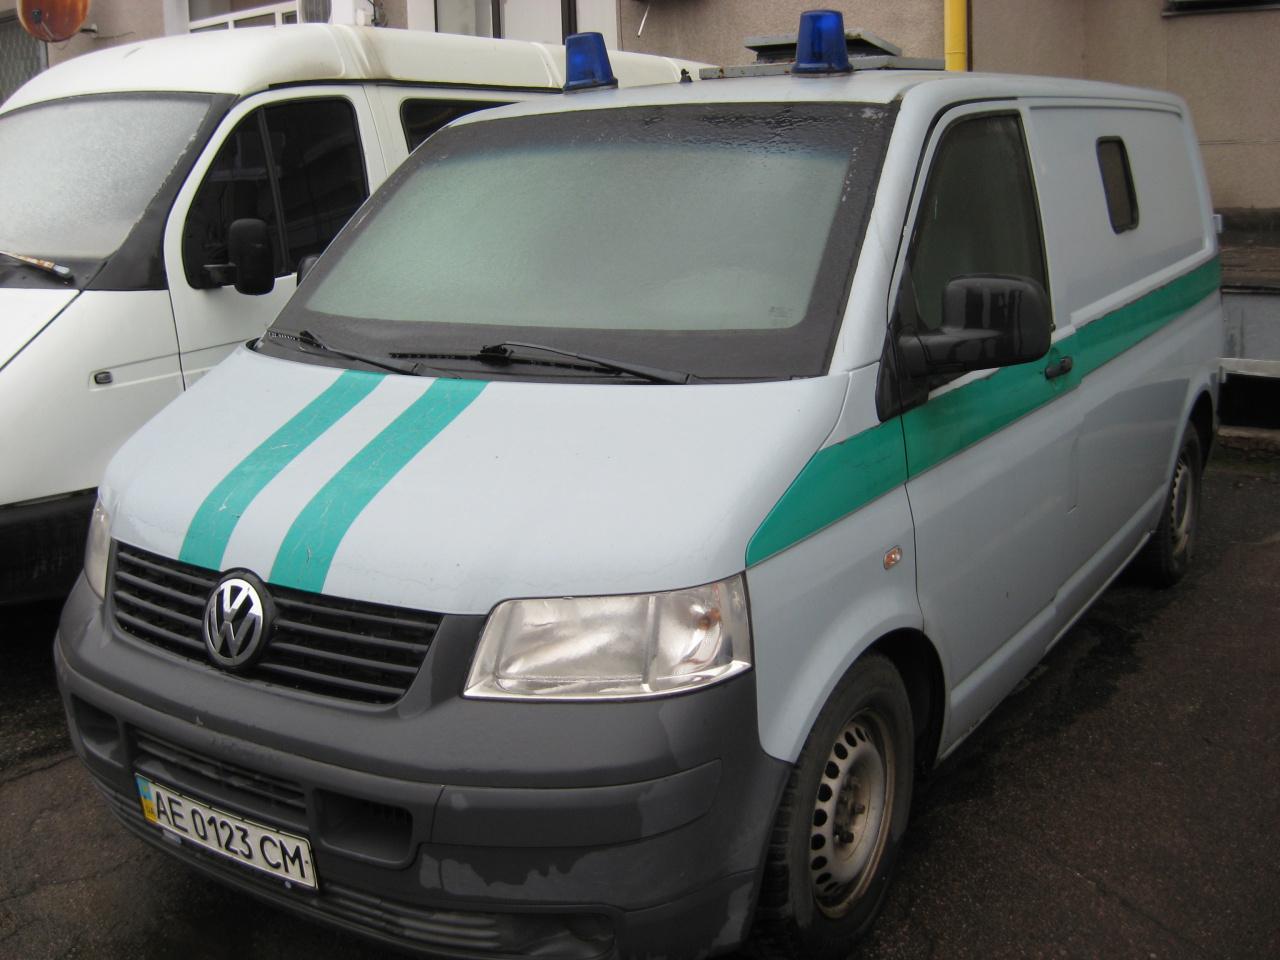 Фургон малотонажний VOLKSWAGEN TRANSPORTER, рік випуску – 2008, номер шасі, кузова WV1ZZZ7HZ8H161924, номер державної реєстрації АЕ0123СМ